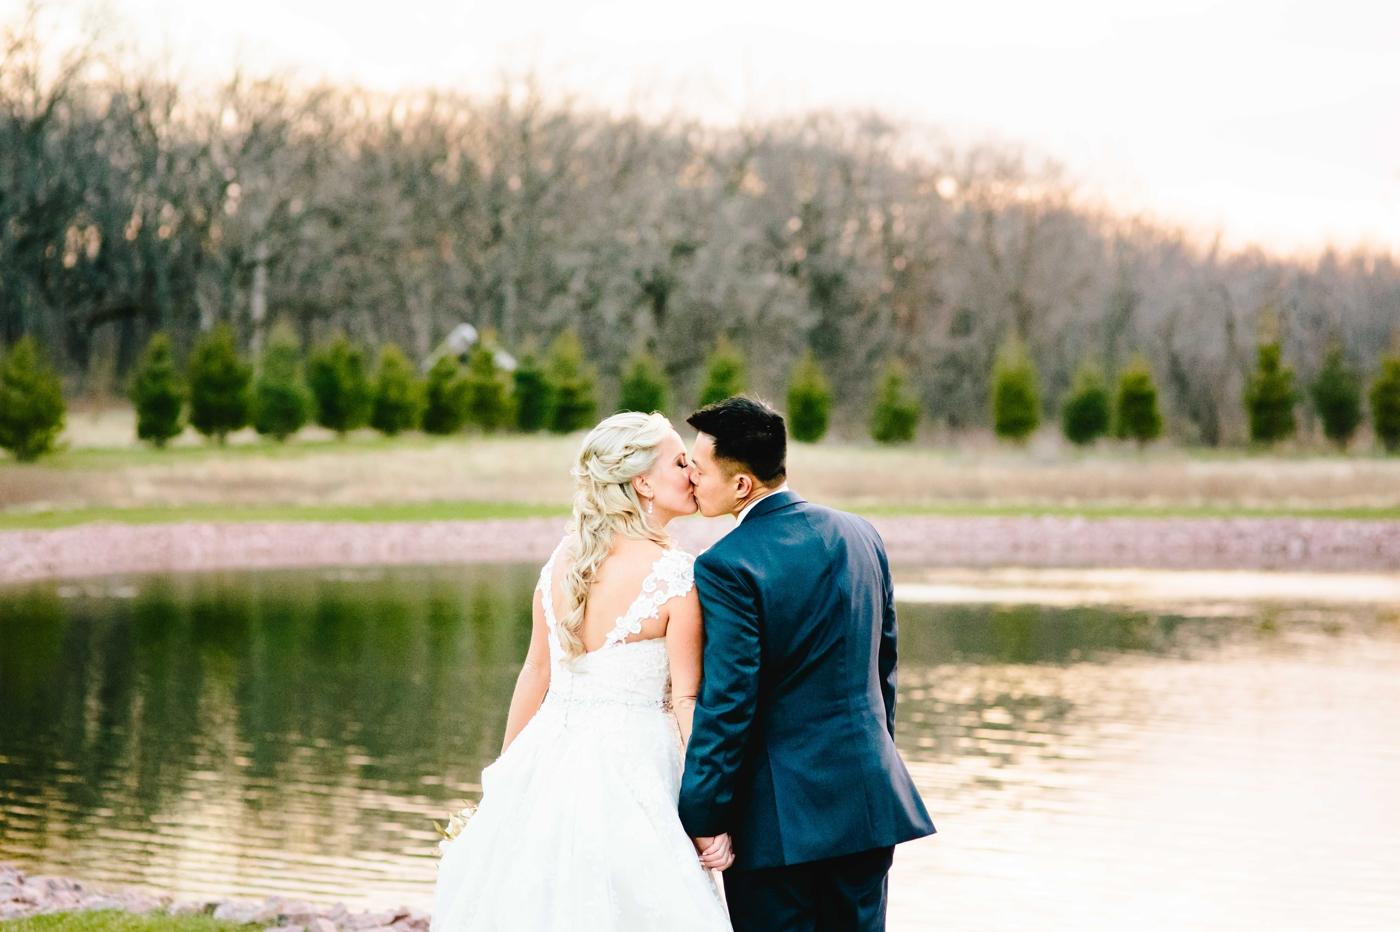 chicago-fine-art-wedding-photography-vo31